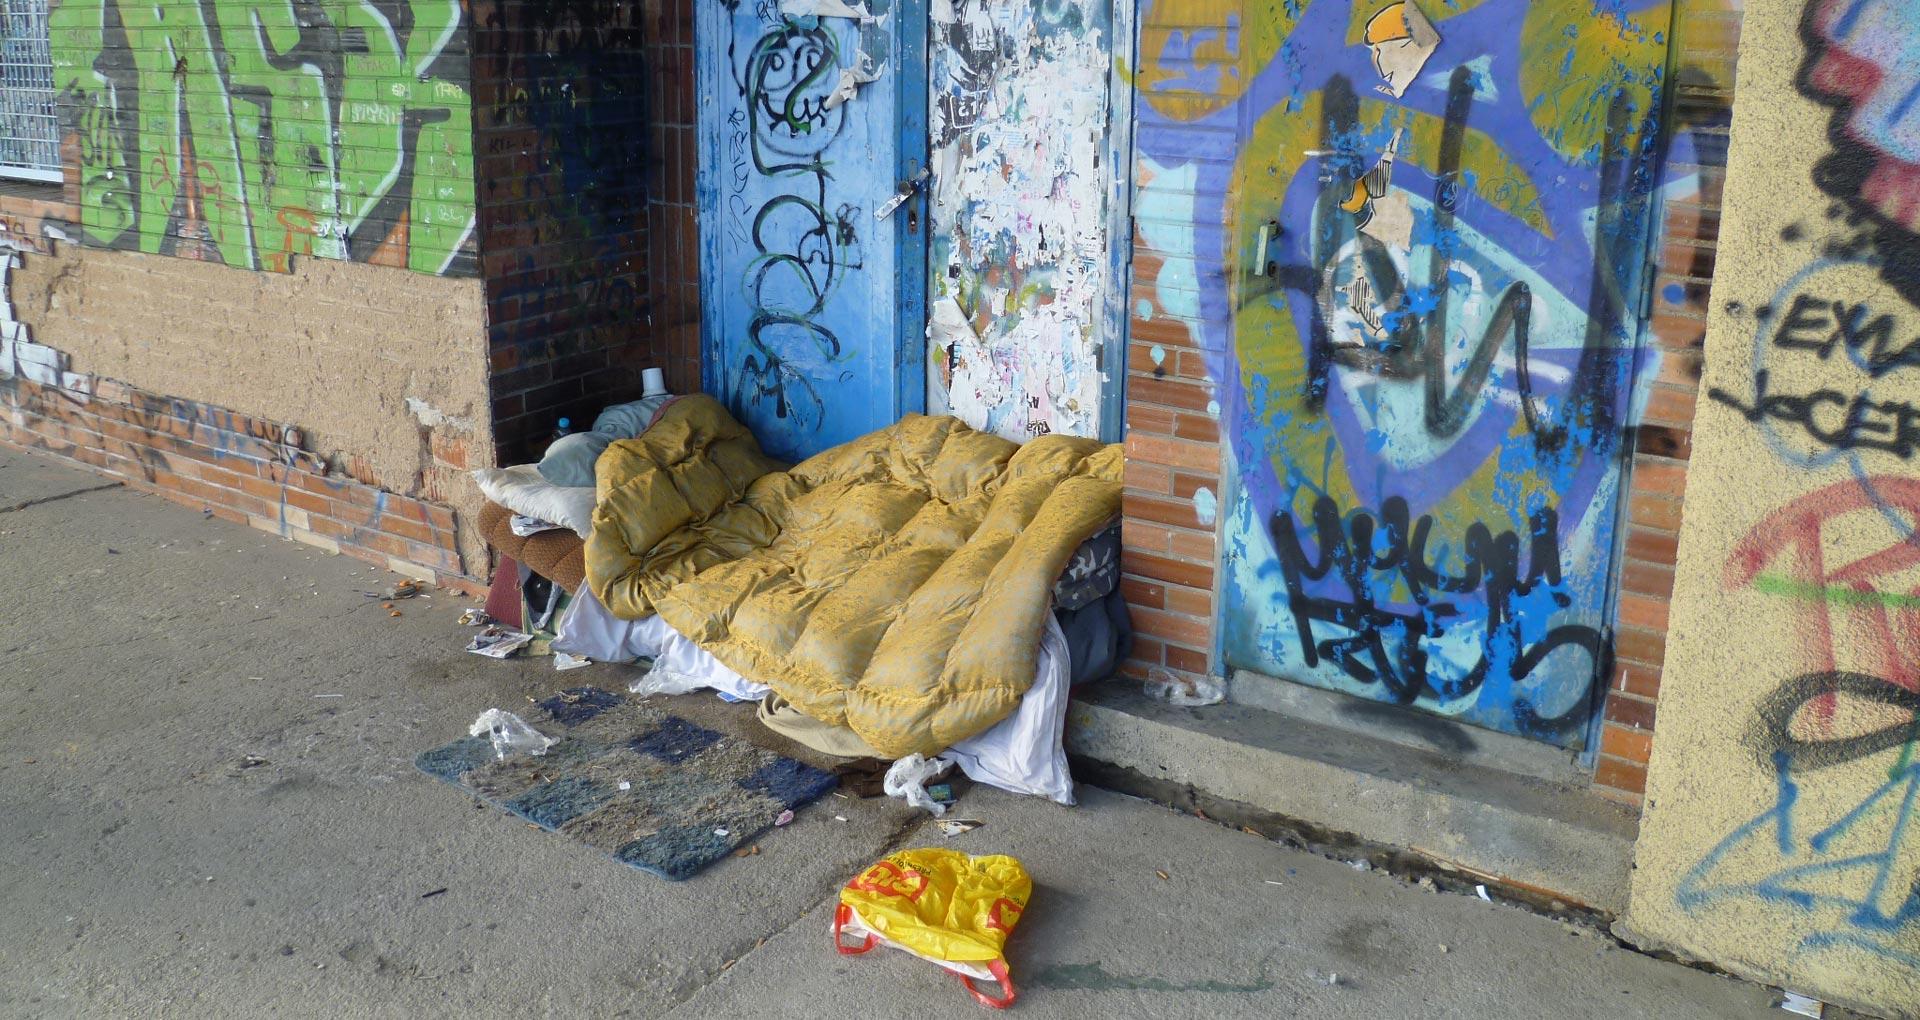 Fenomén bezdomovectví